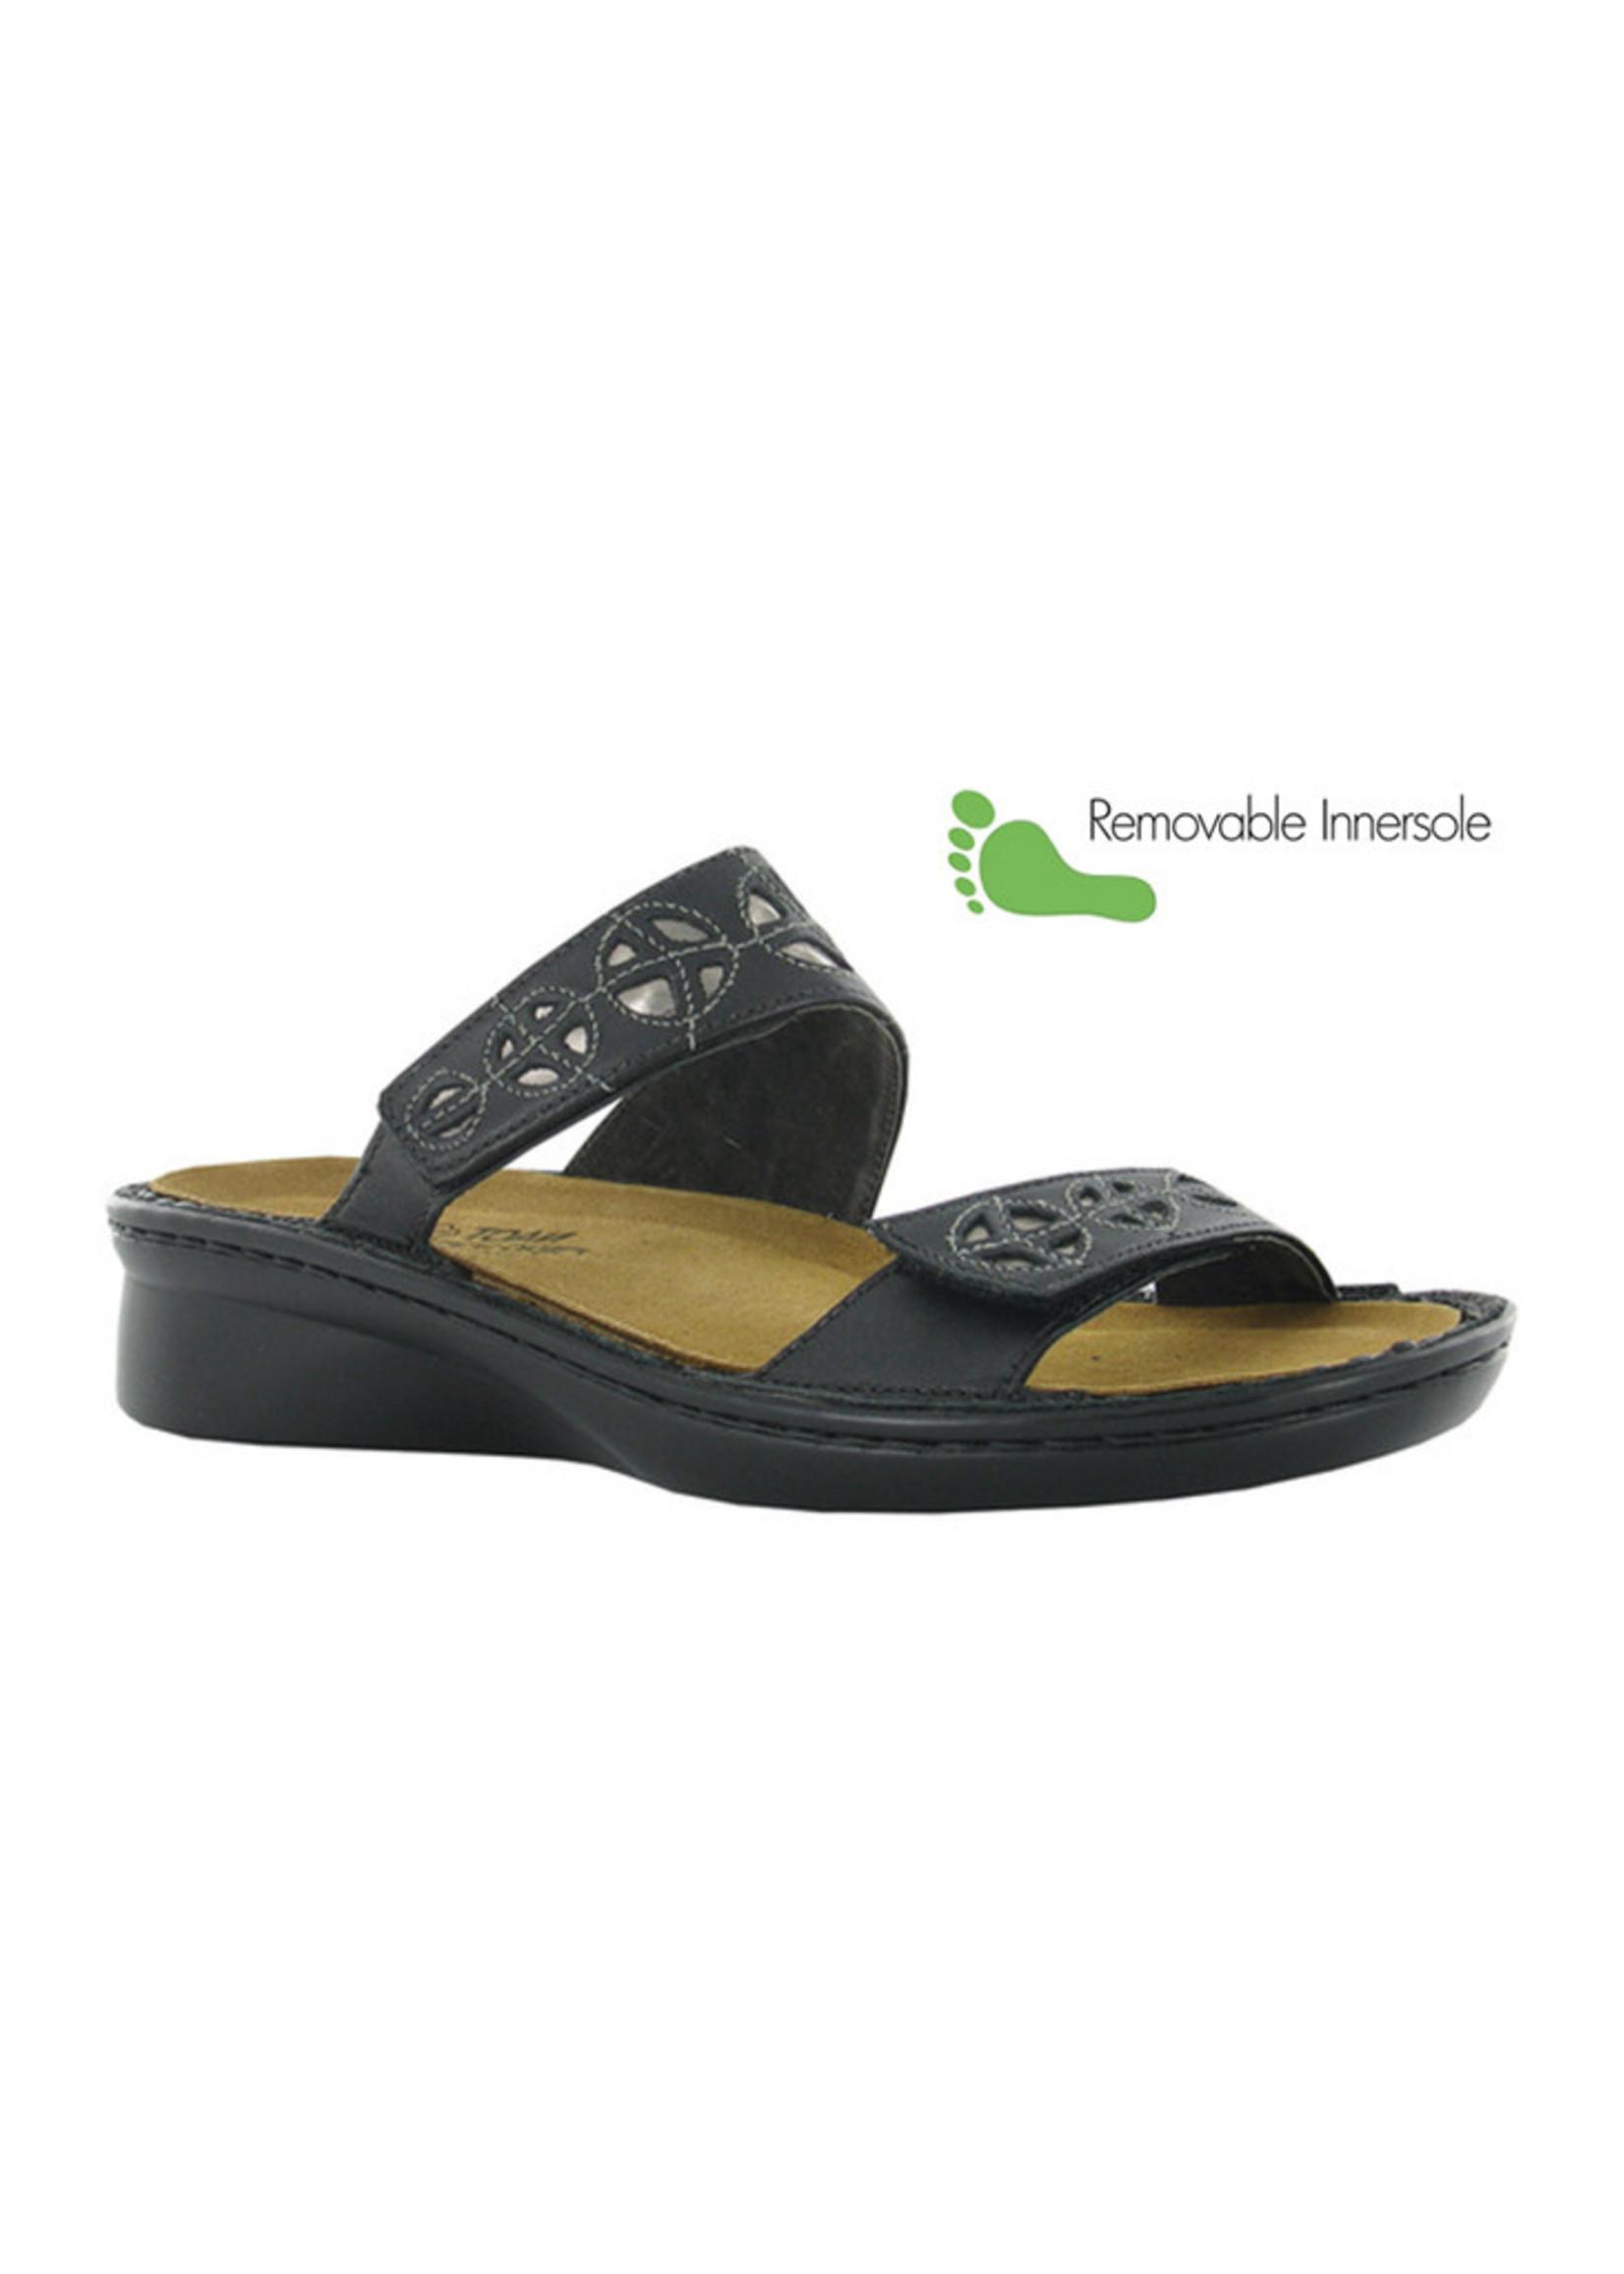 Naot Footwear Cornet in Black Combo